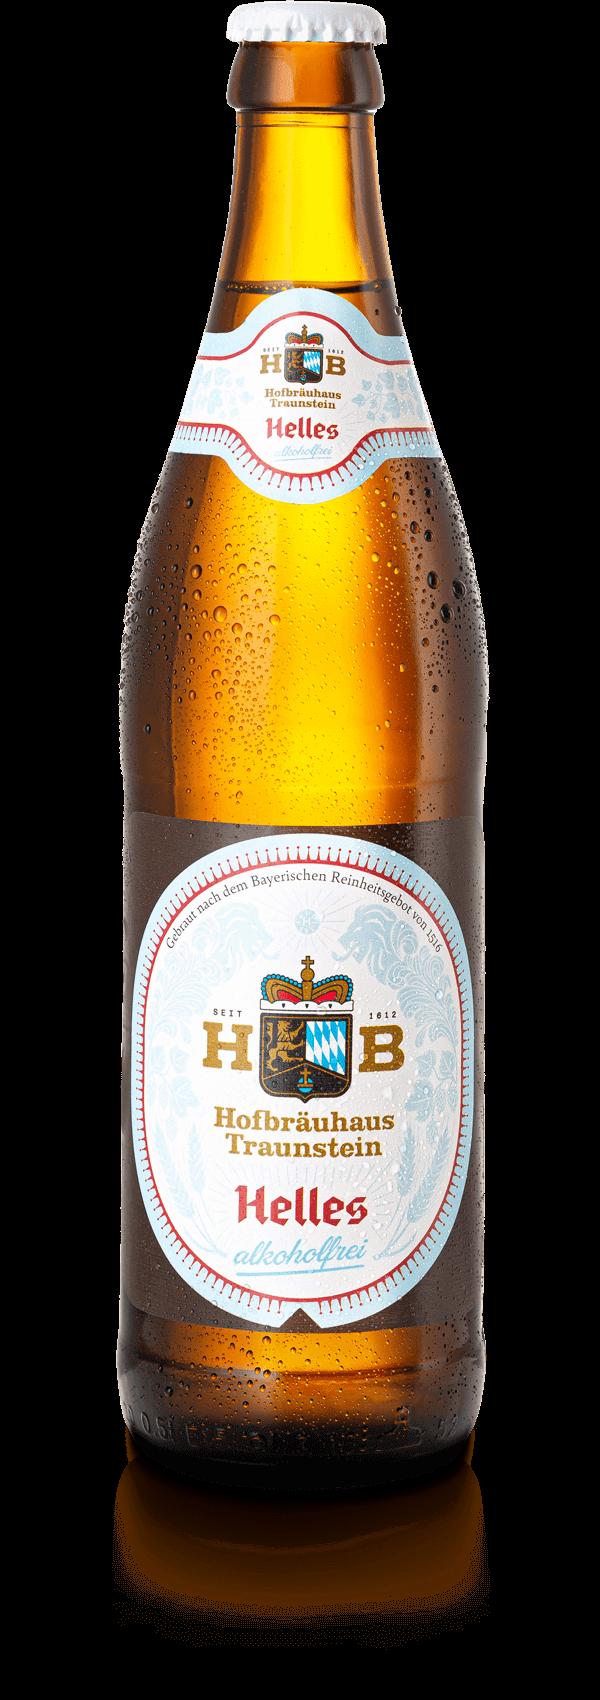 hb-ts-helles-alkoholfrei